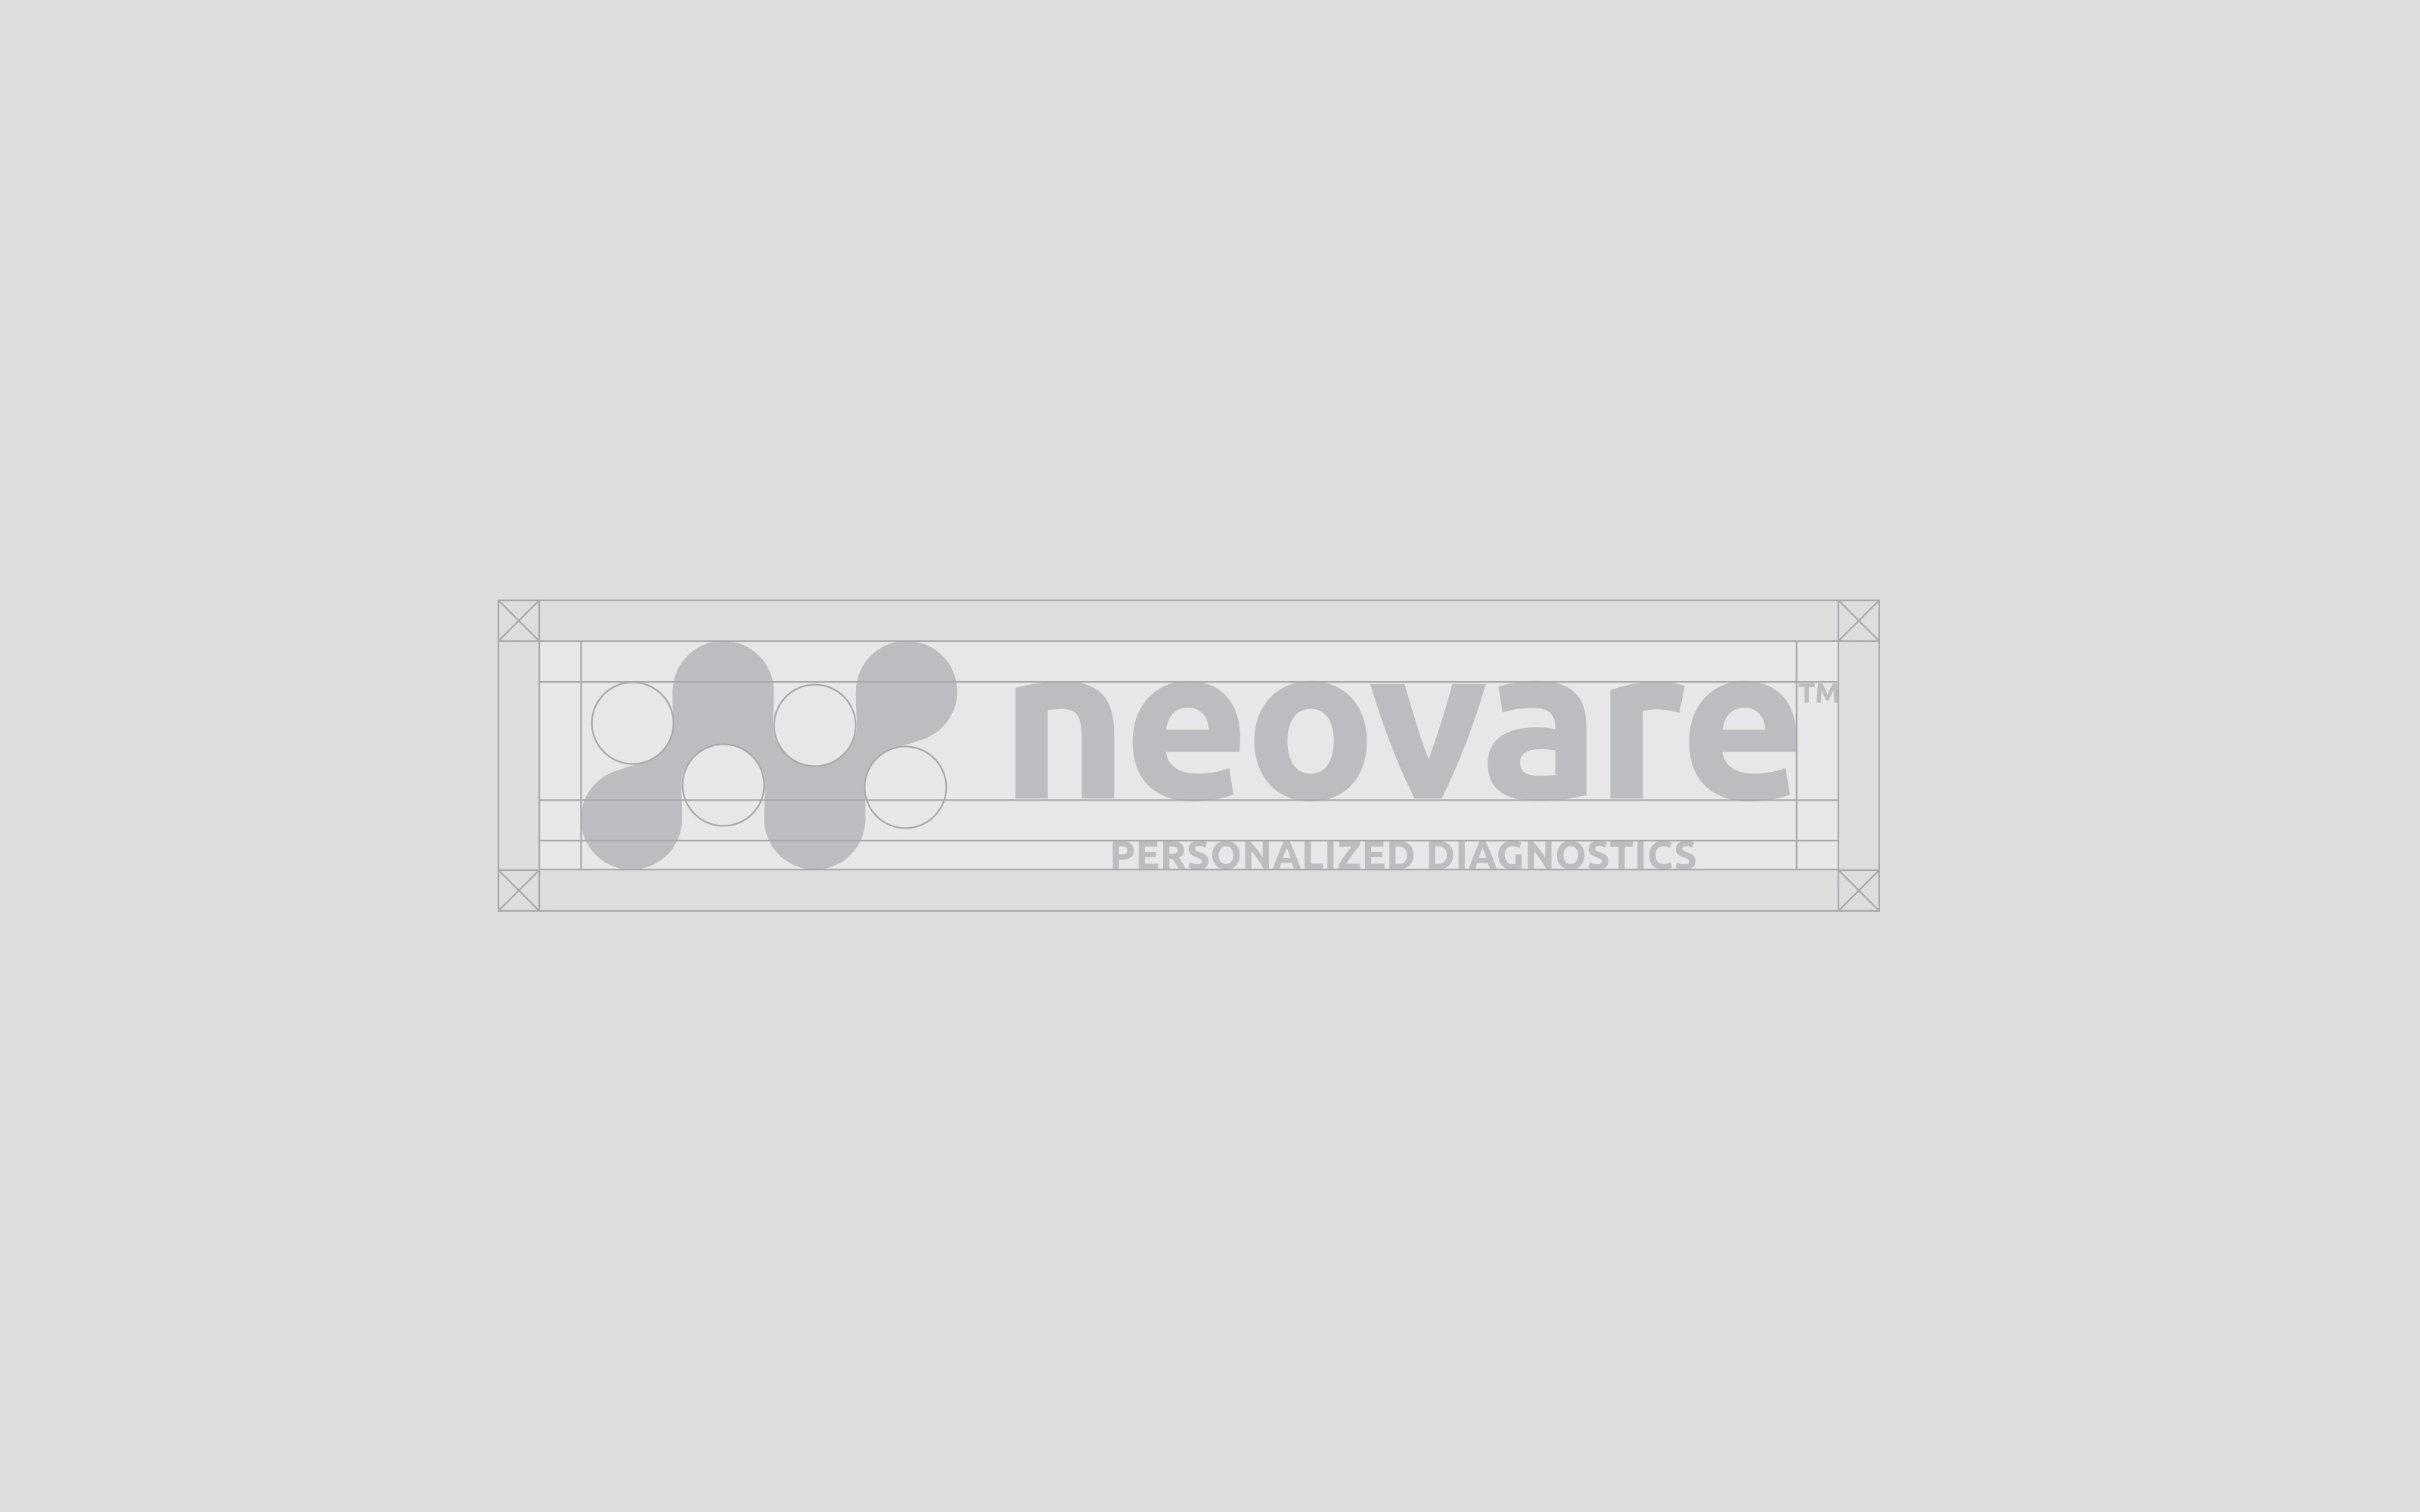 03_Neovare_Logo